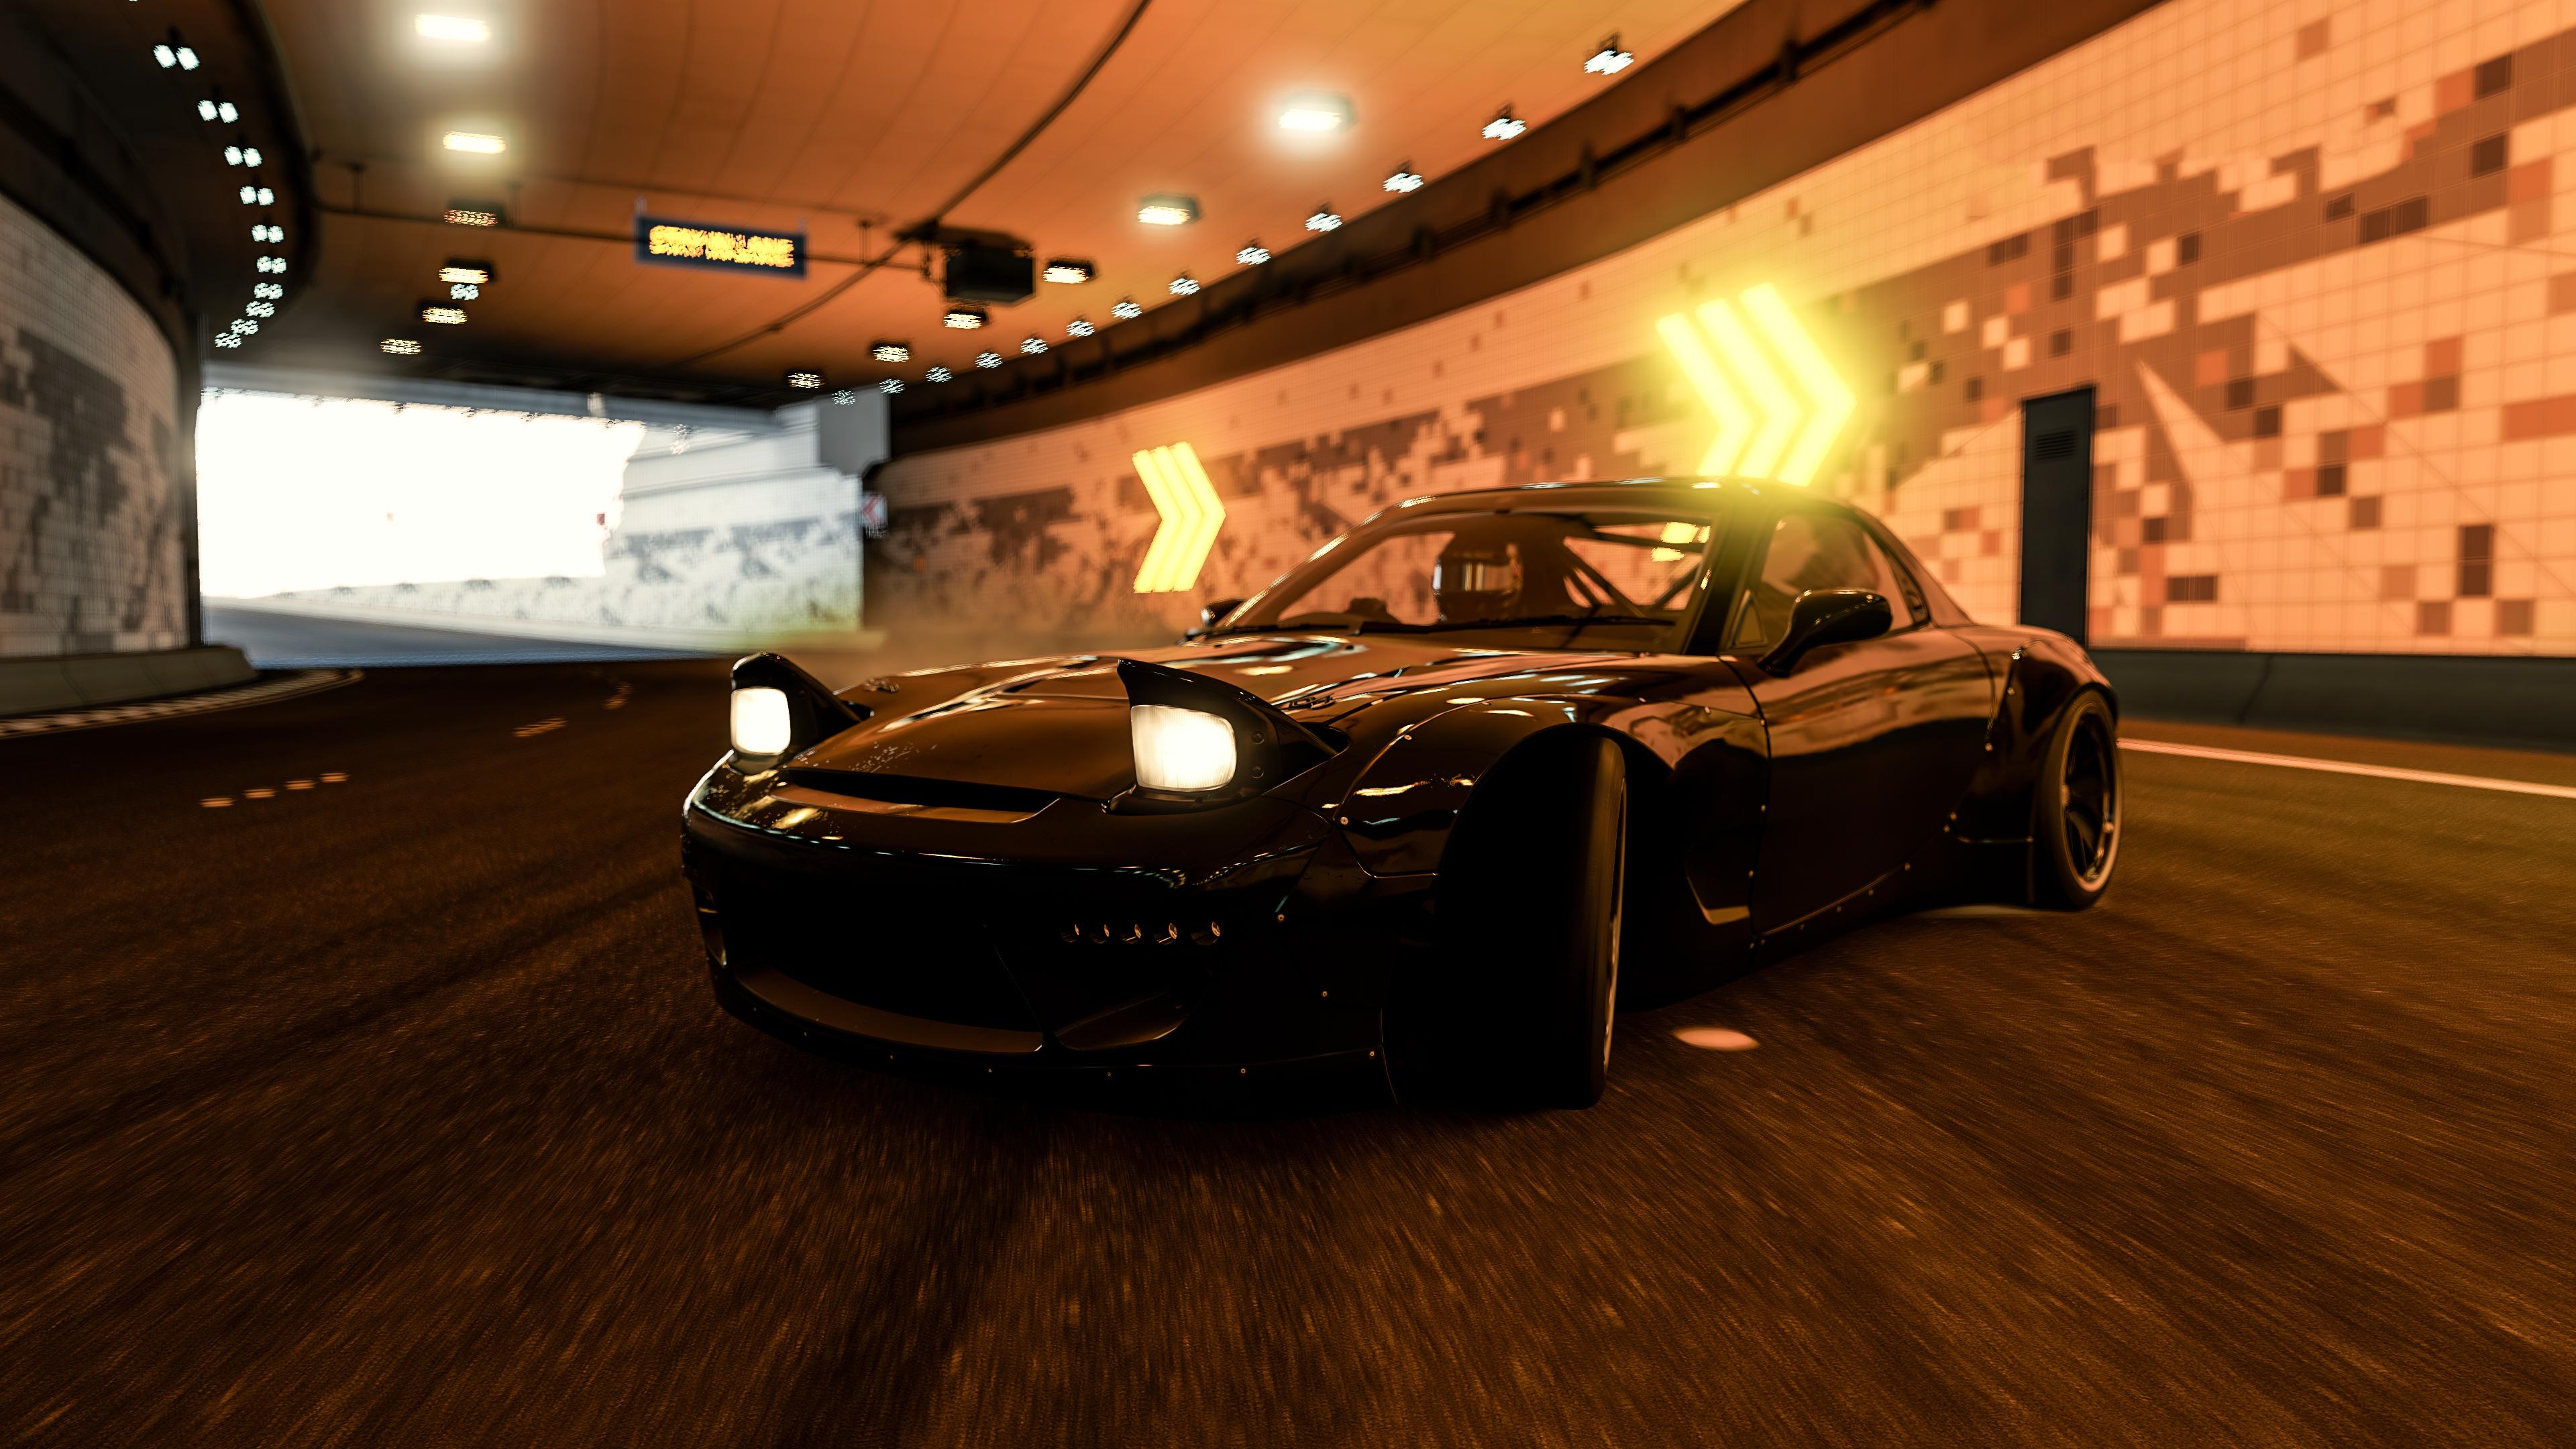 Wallpaper 4k 2018 Forza Motorsport 7 4k 4k Wallpapers Cars